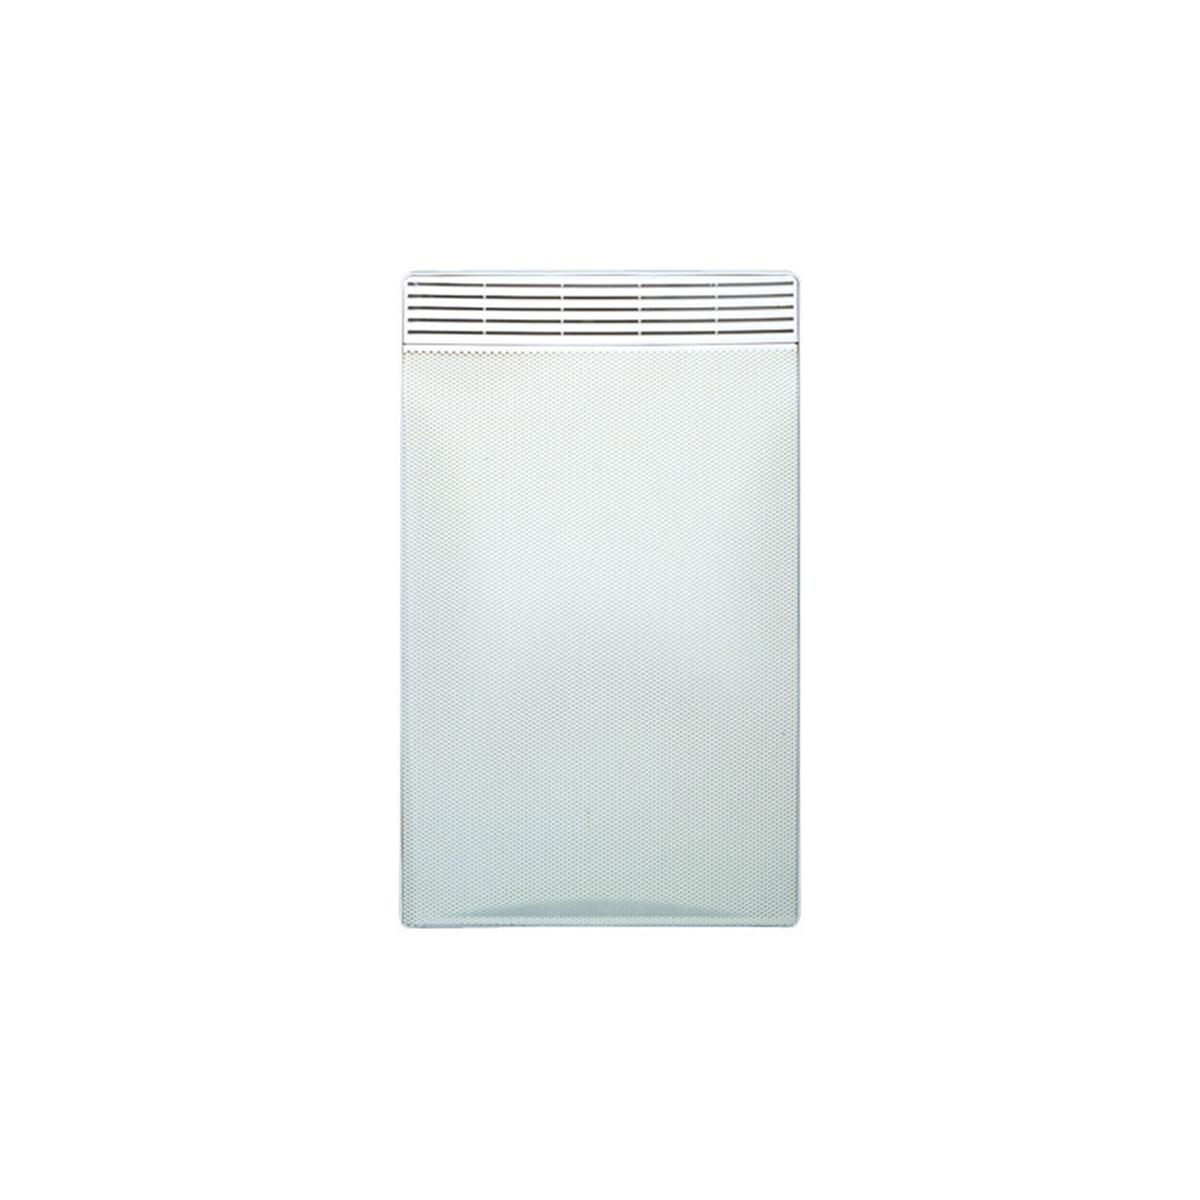 radiateur panneaux rayonnant atlantic solius 2000 watt. Black Bedroom Furniture Sets. Home Design Ideas